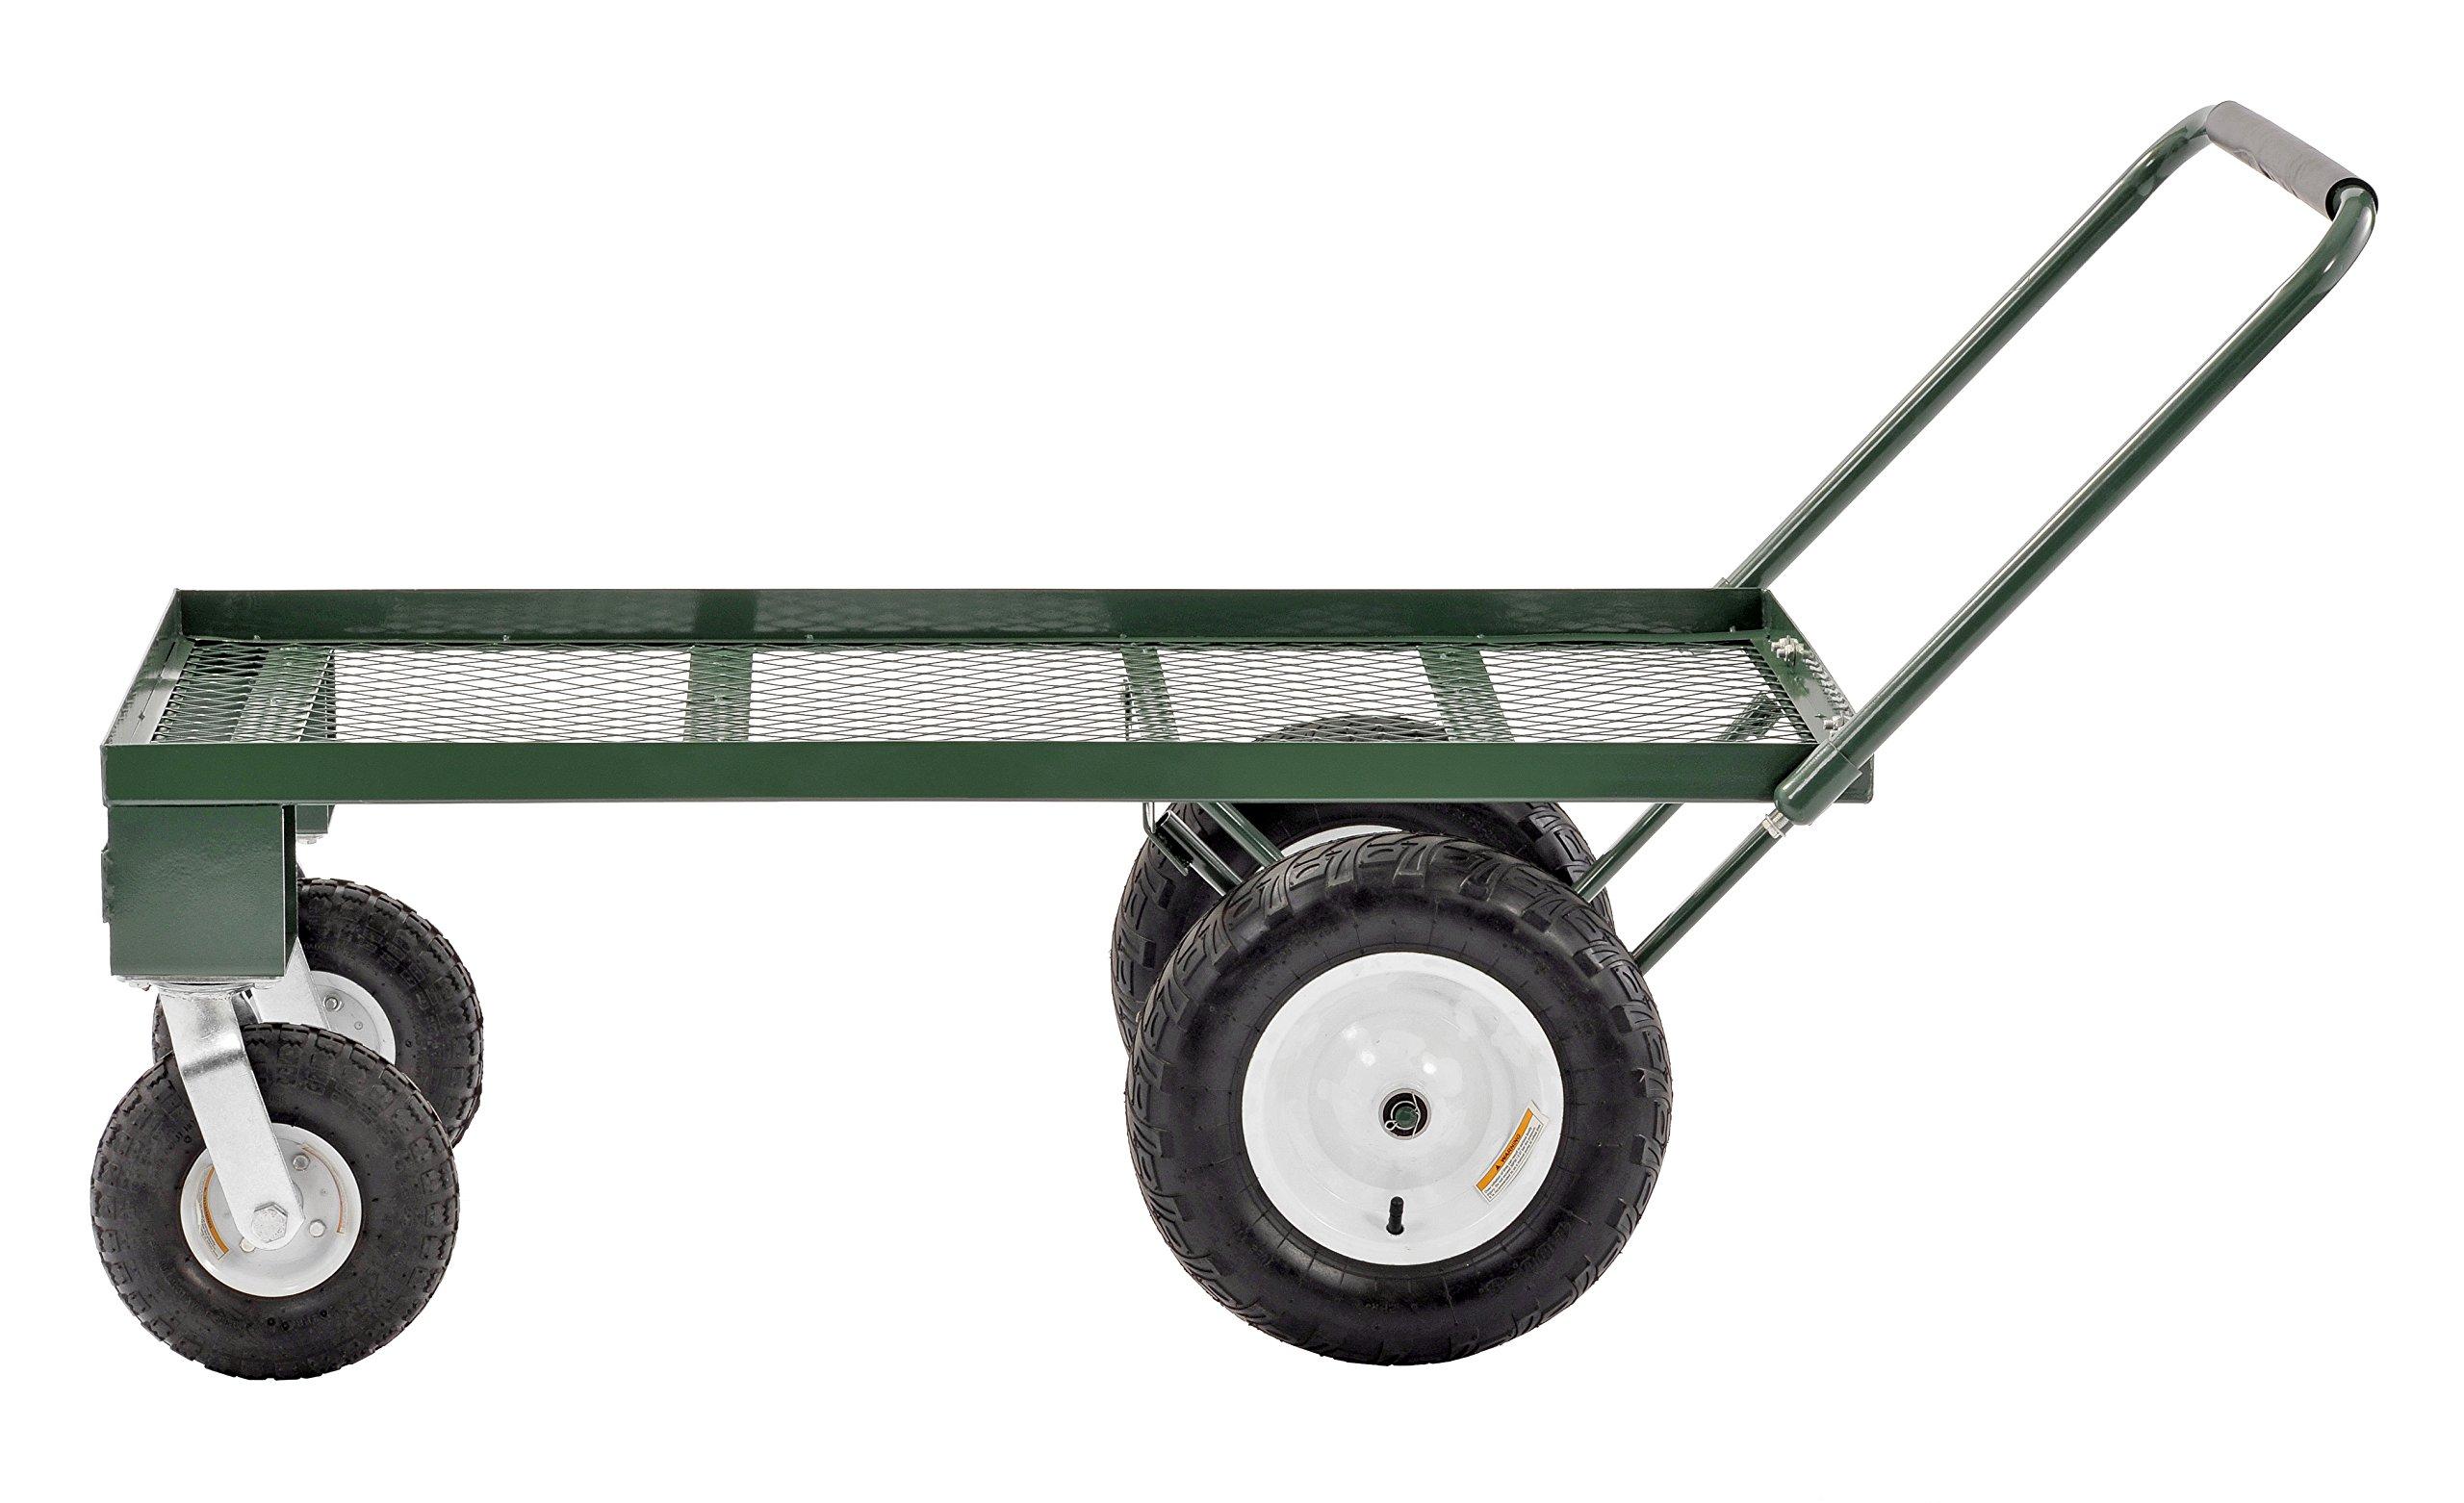 Sandusky FW4824 Heavy Duty Steel 4 Wheel Flat Wagon with Pull Handle, 750 lbs Capacity, 48'' Length x 24'' Width